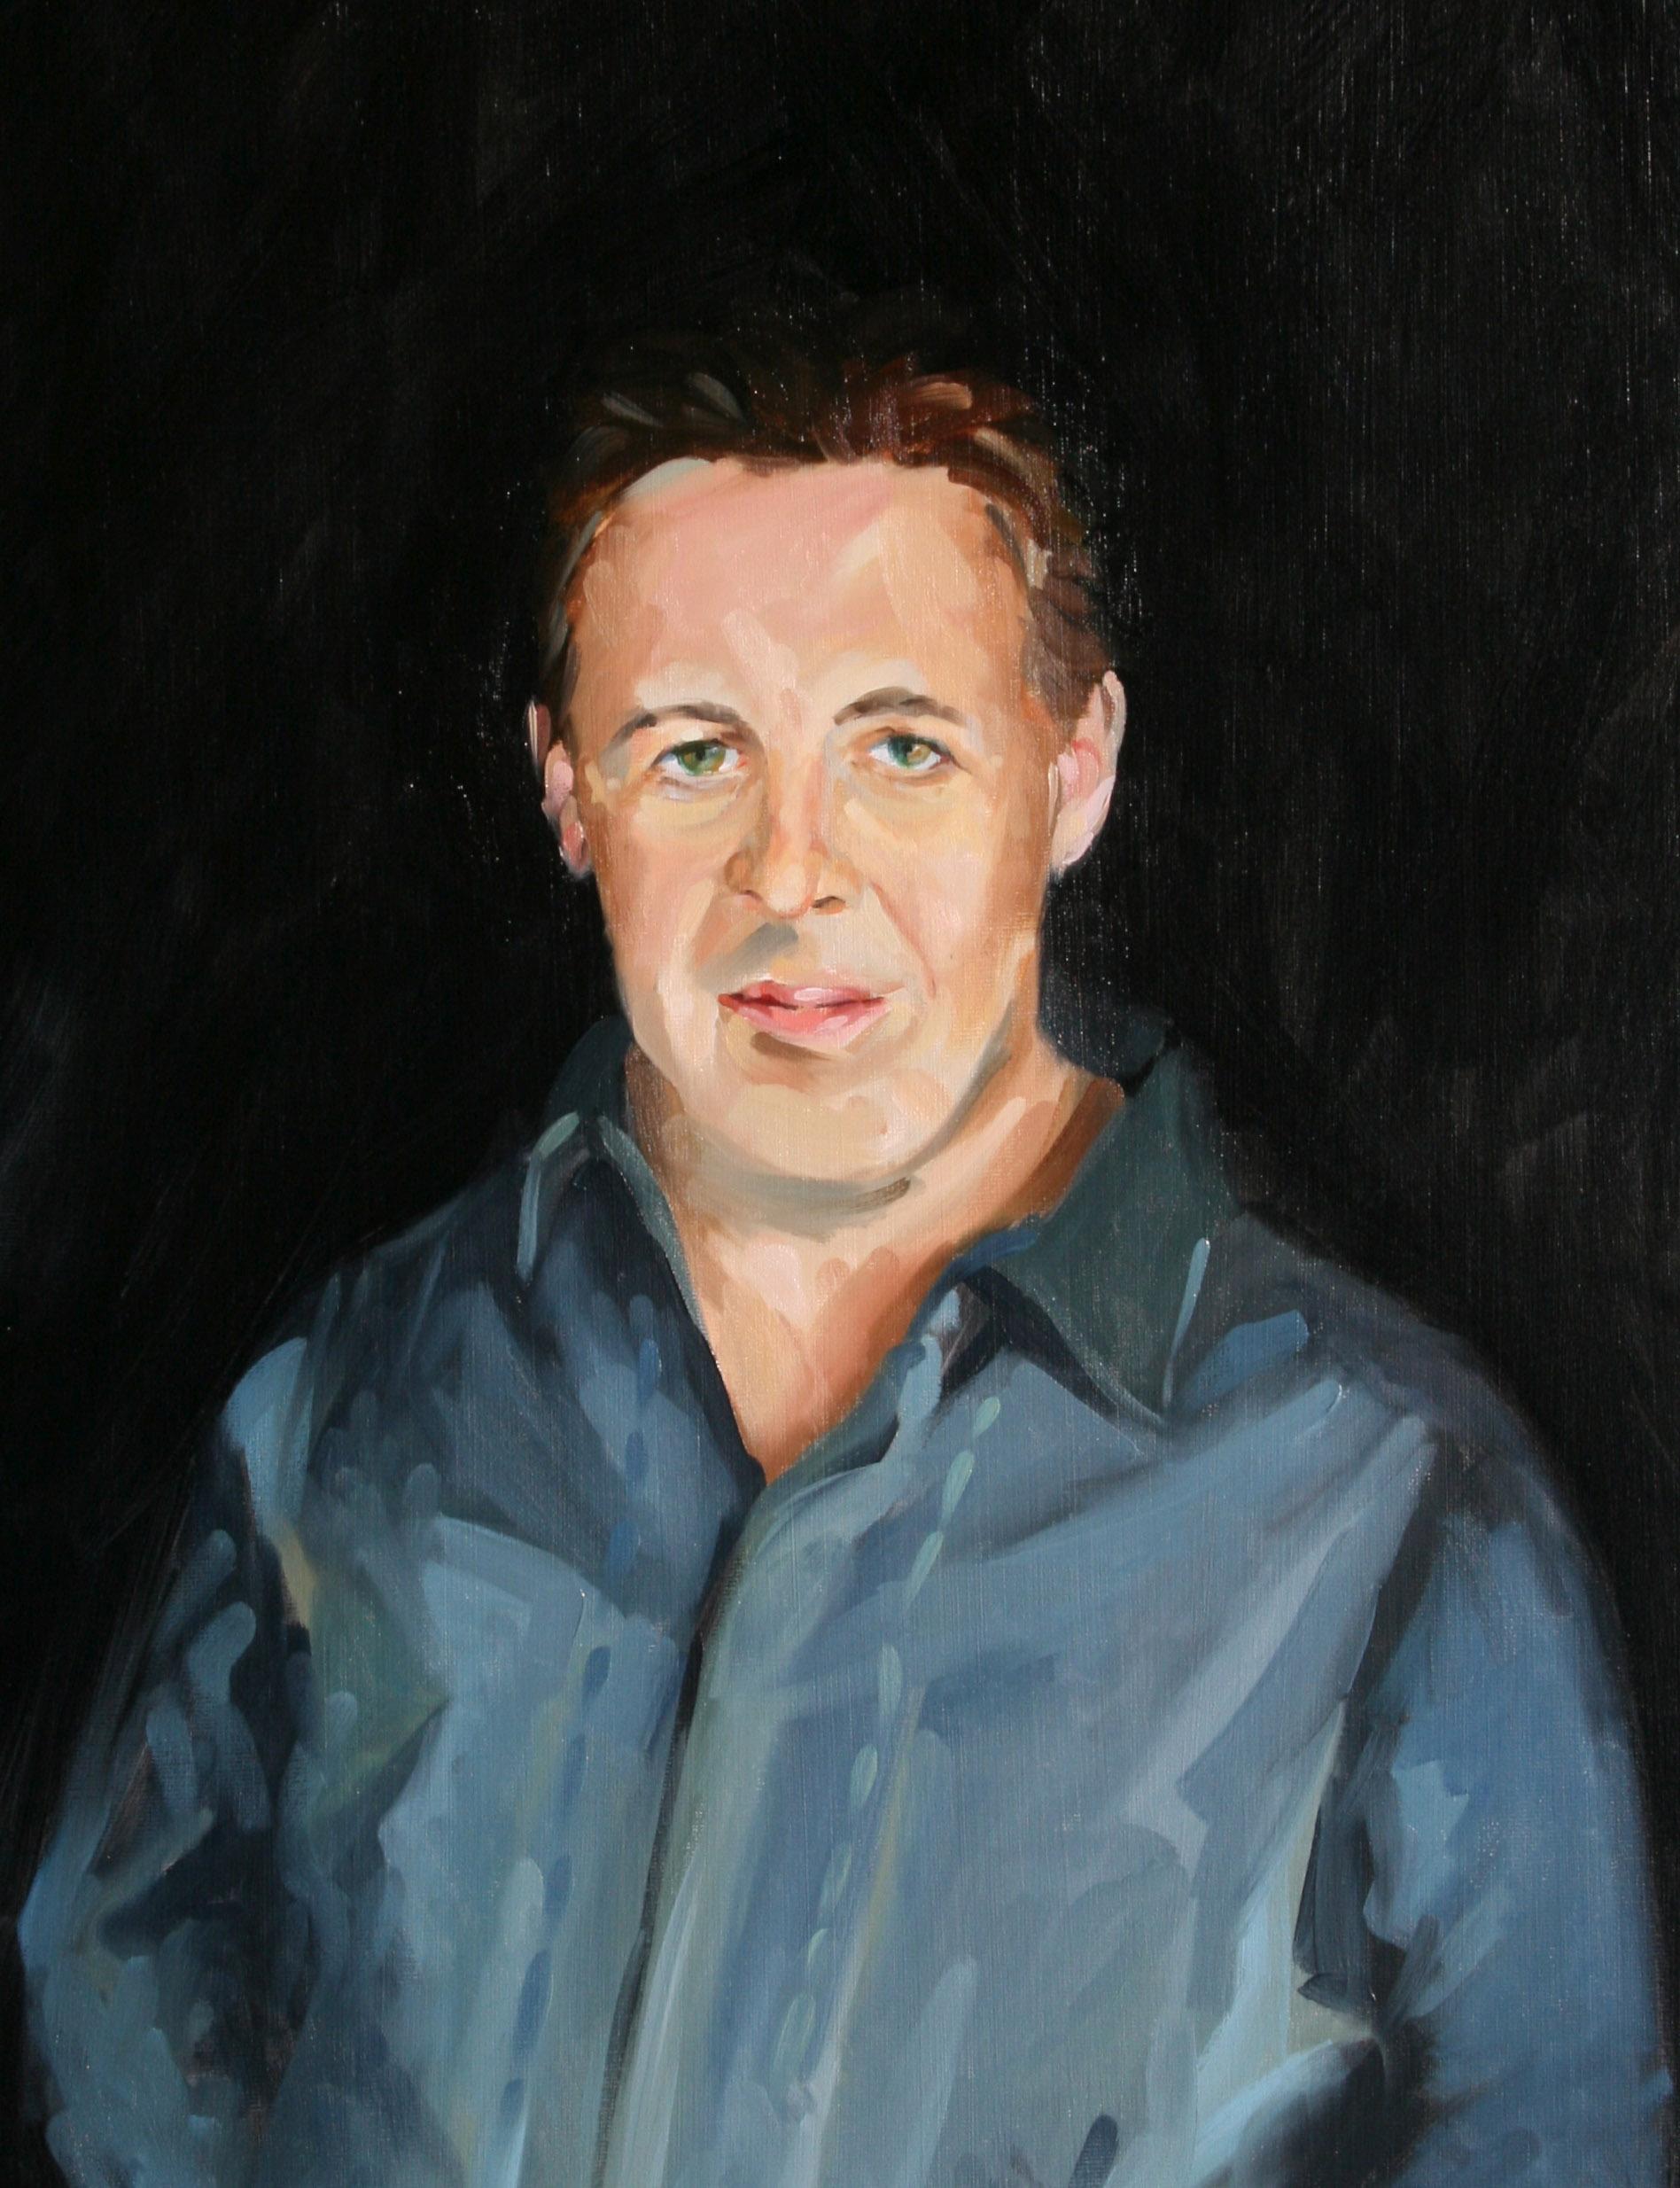 Ian Dempsey